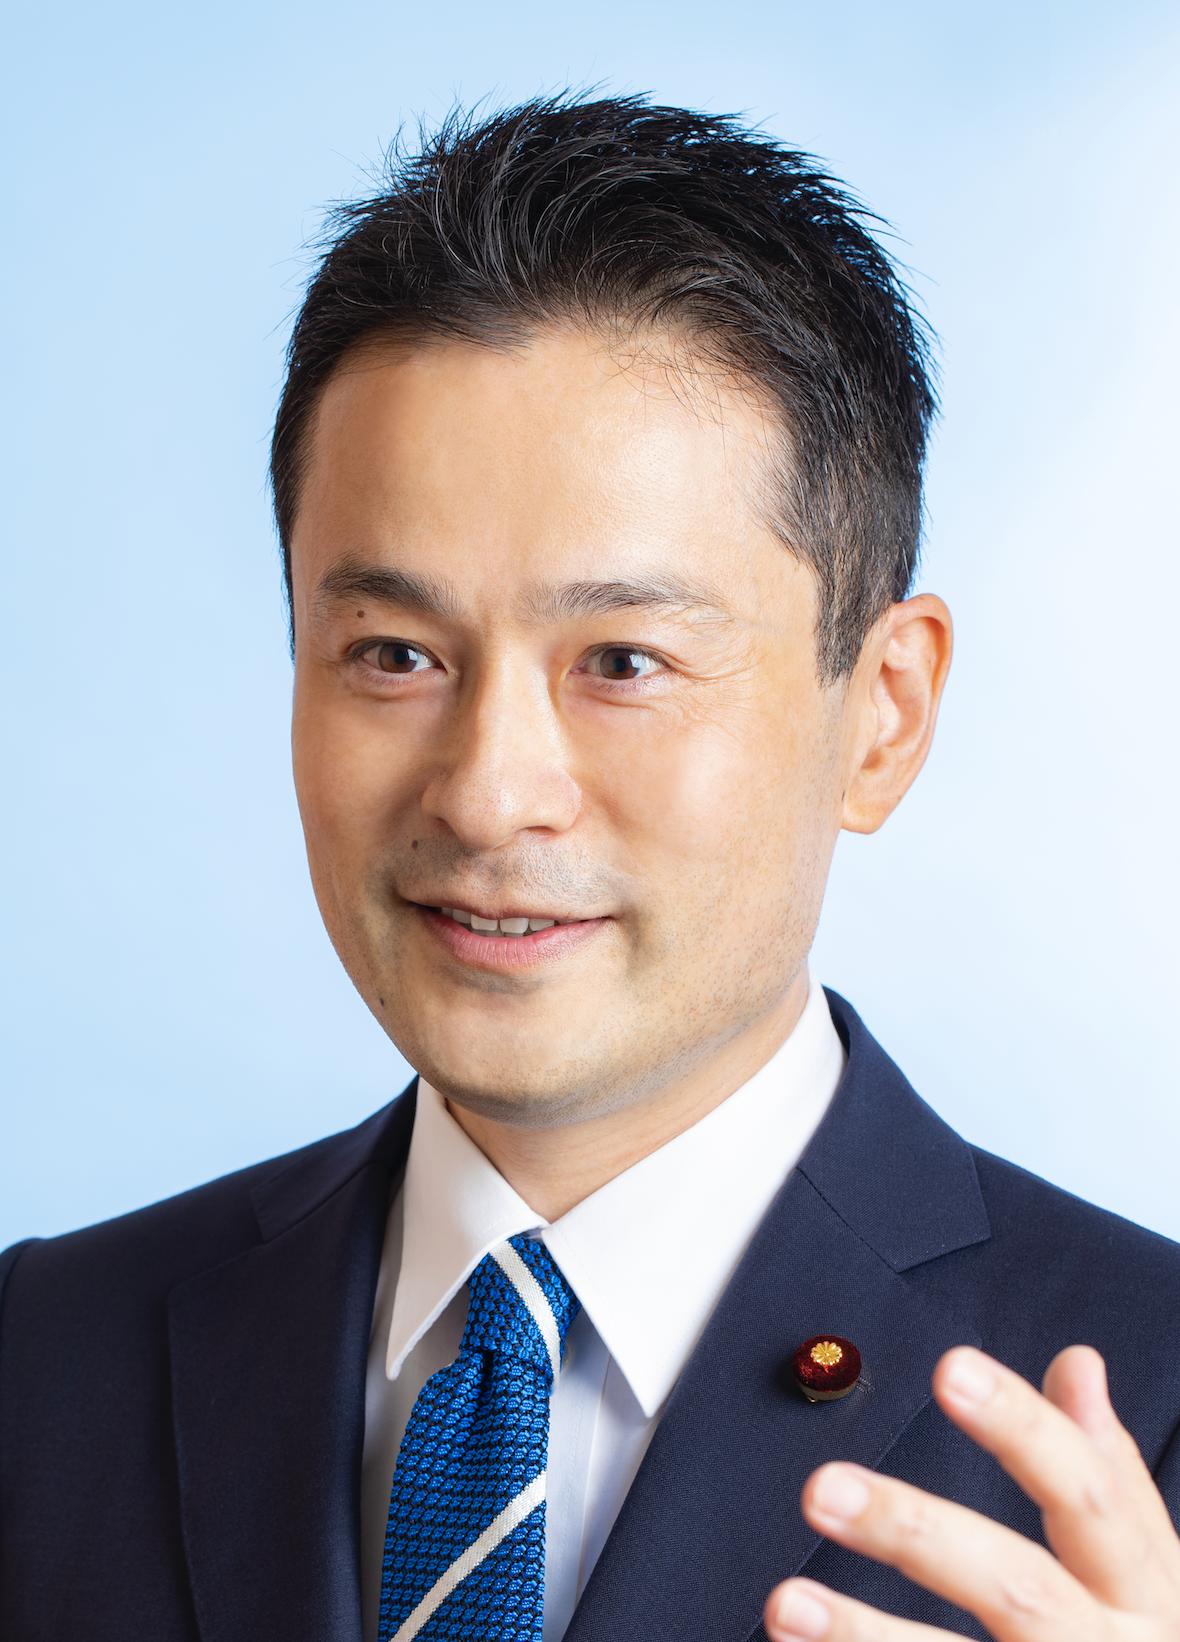 斉木 武志